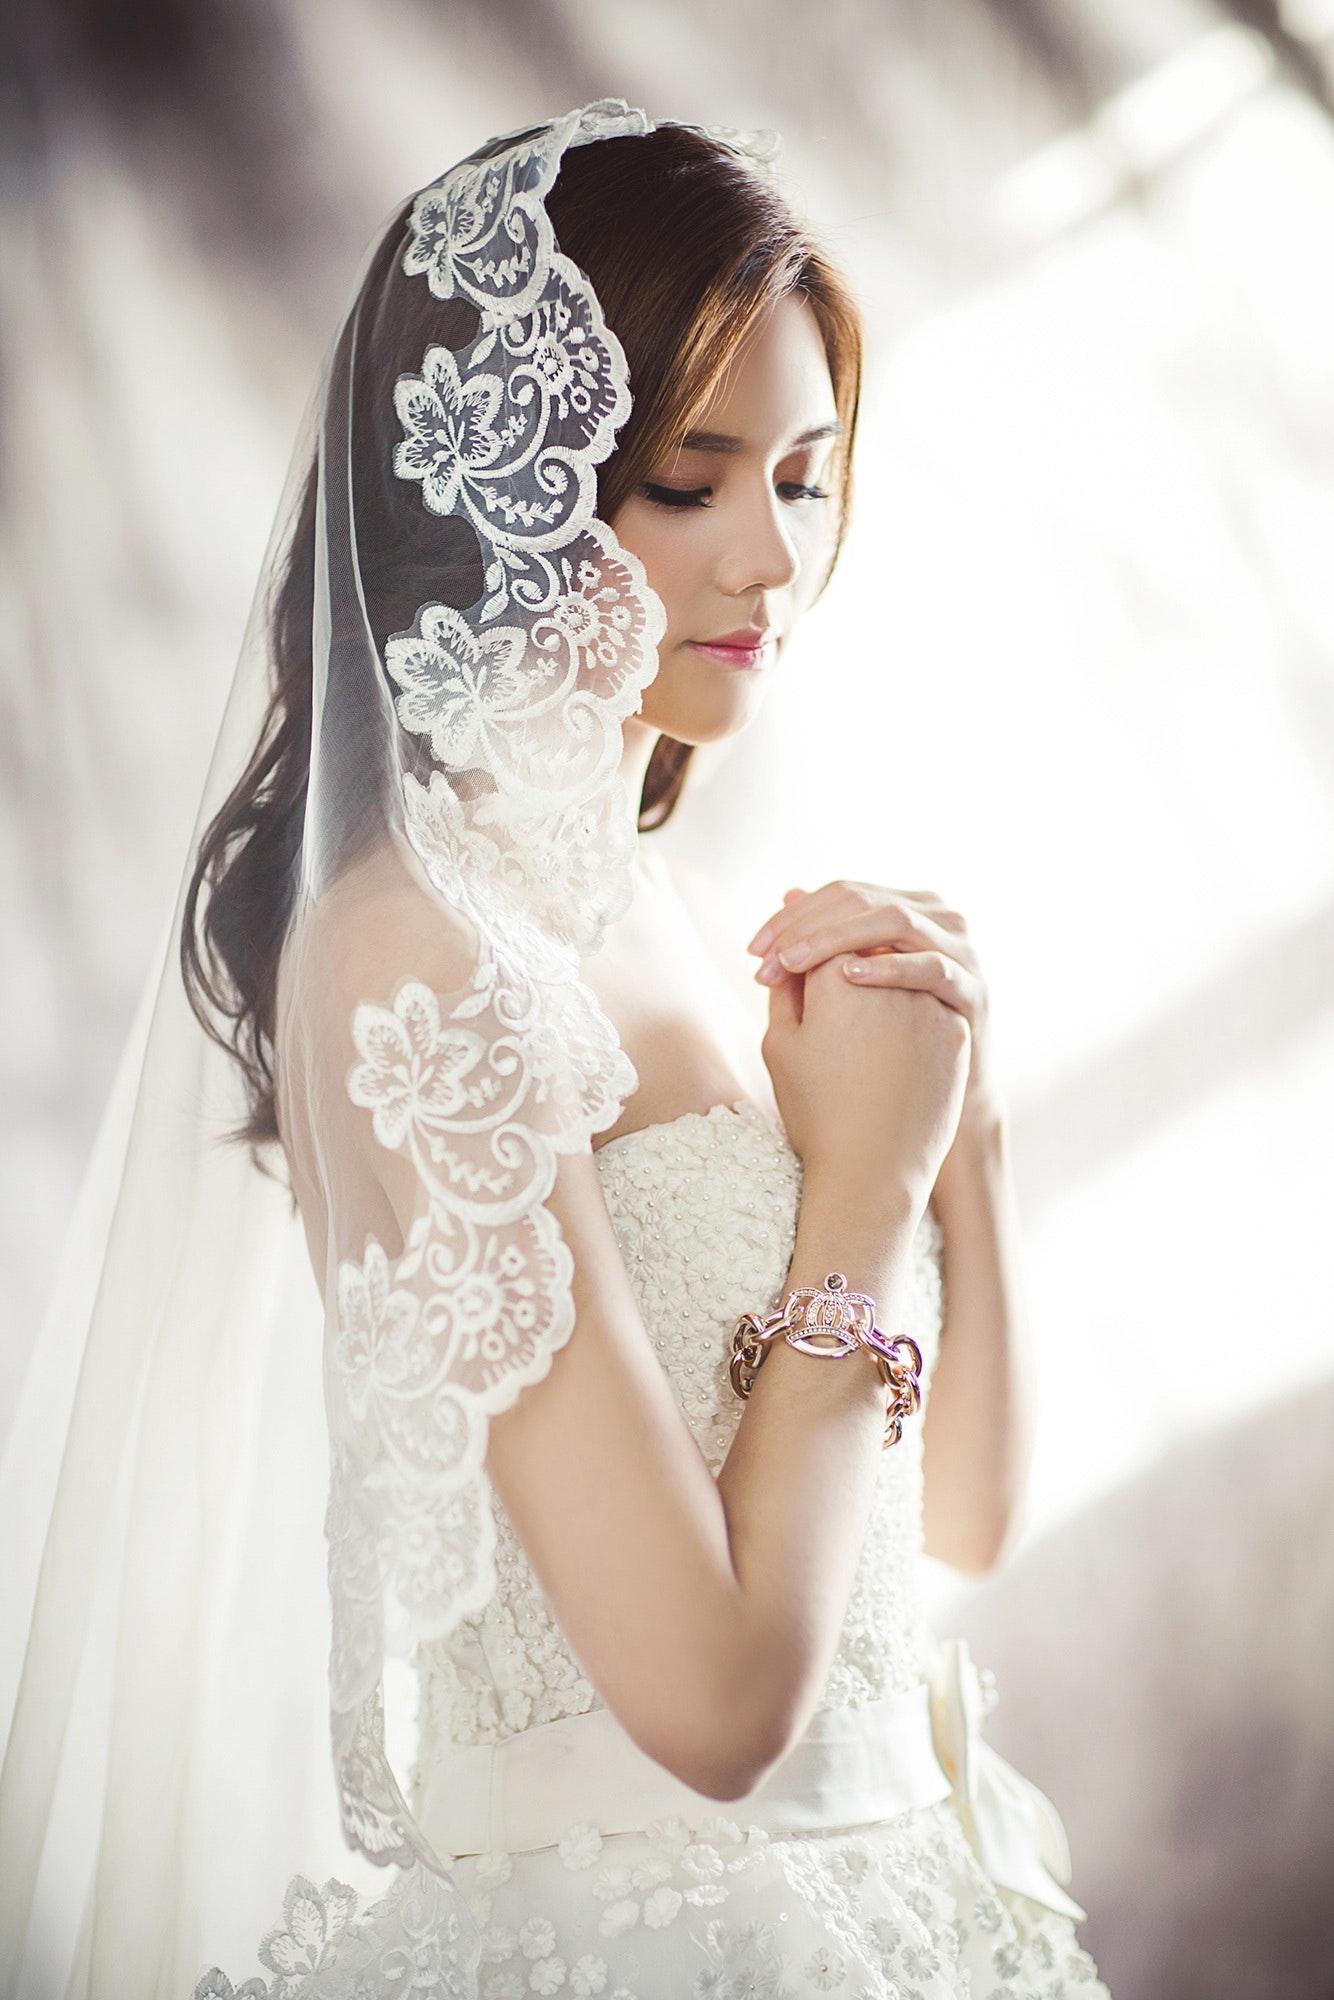 طرحة عروس